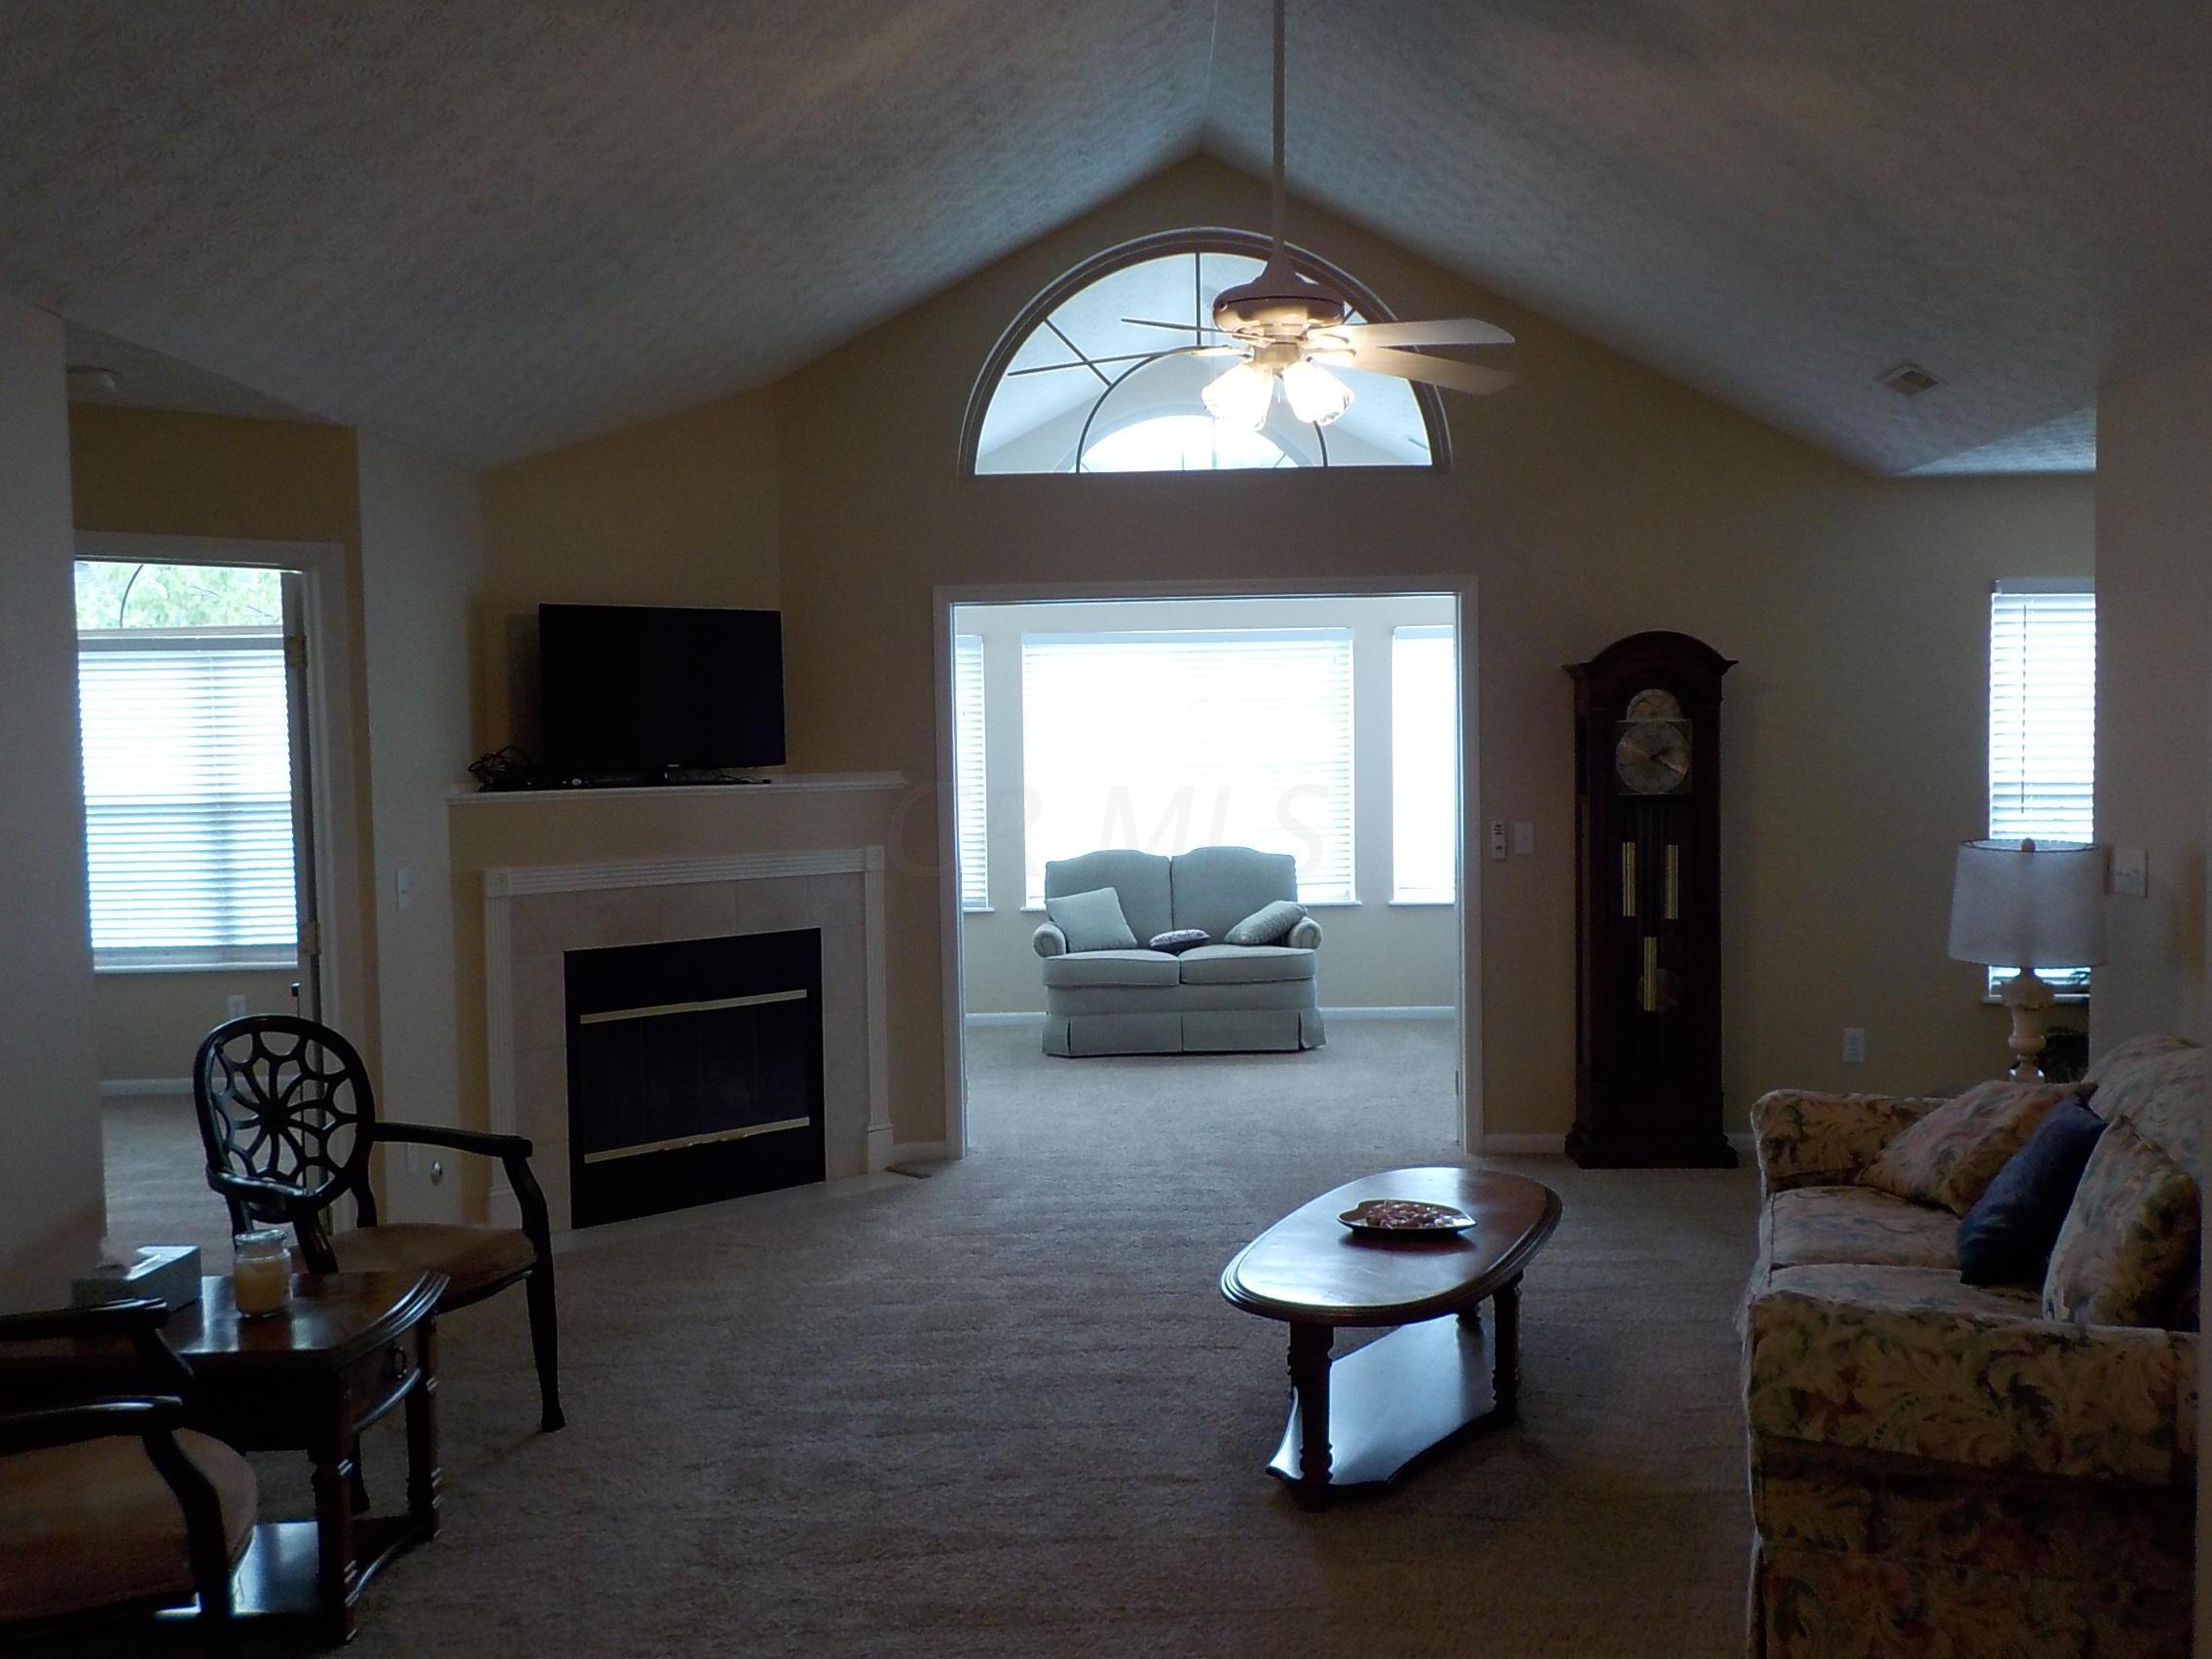 4356 Crimson Maple Lane, Westerville, Ohio 43082, 2 Bedrooms Bedrooms, ,2 BathroomsBathrooms,Residential,For Sale,Crimson Maple,220040185